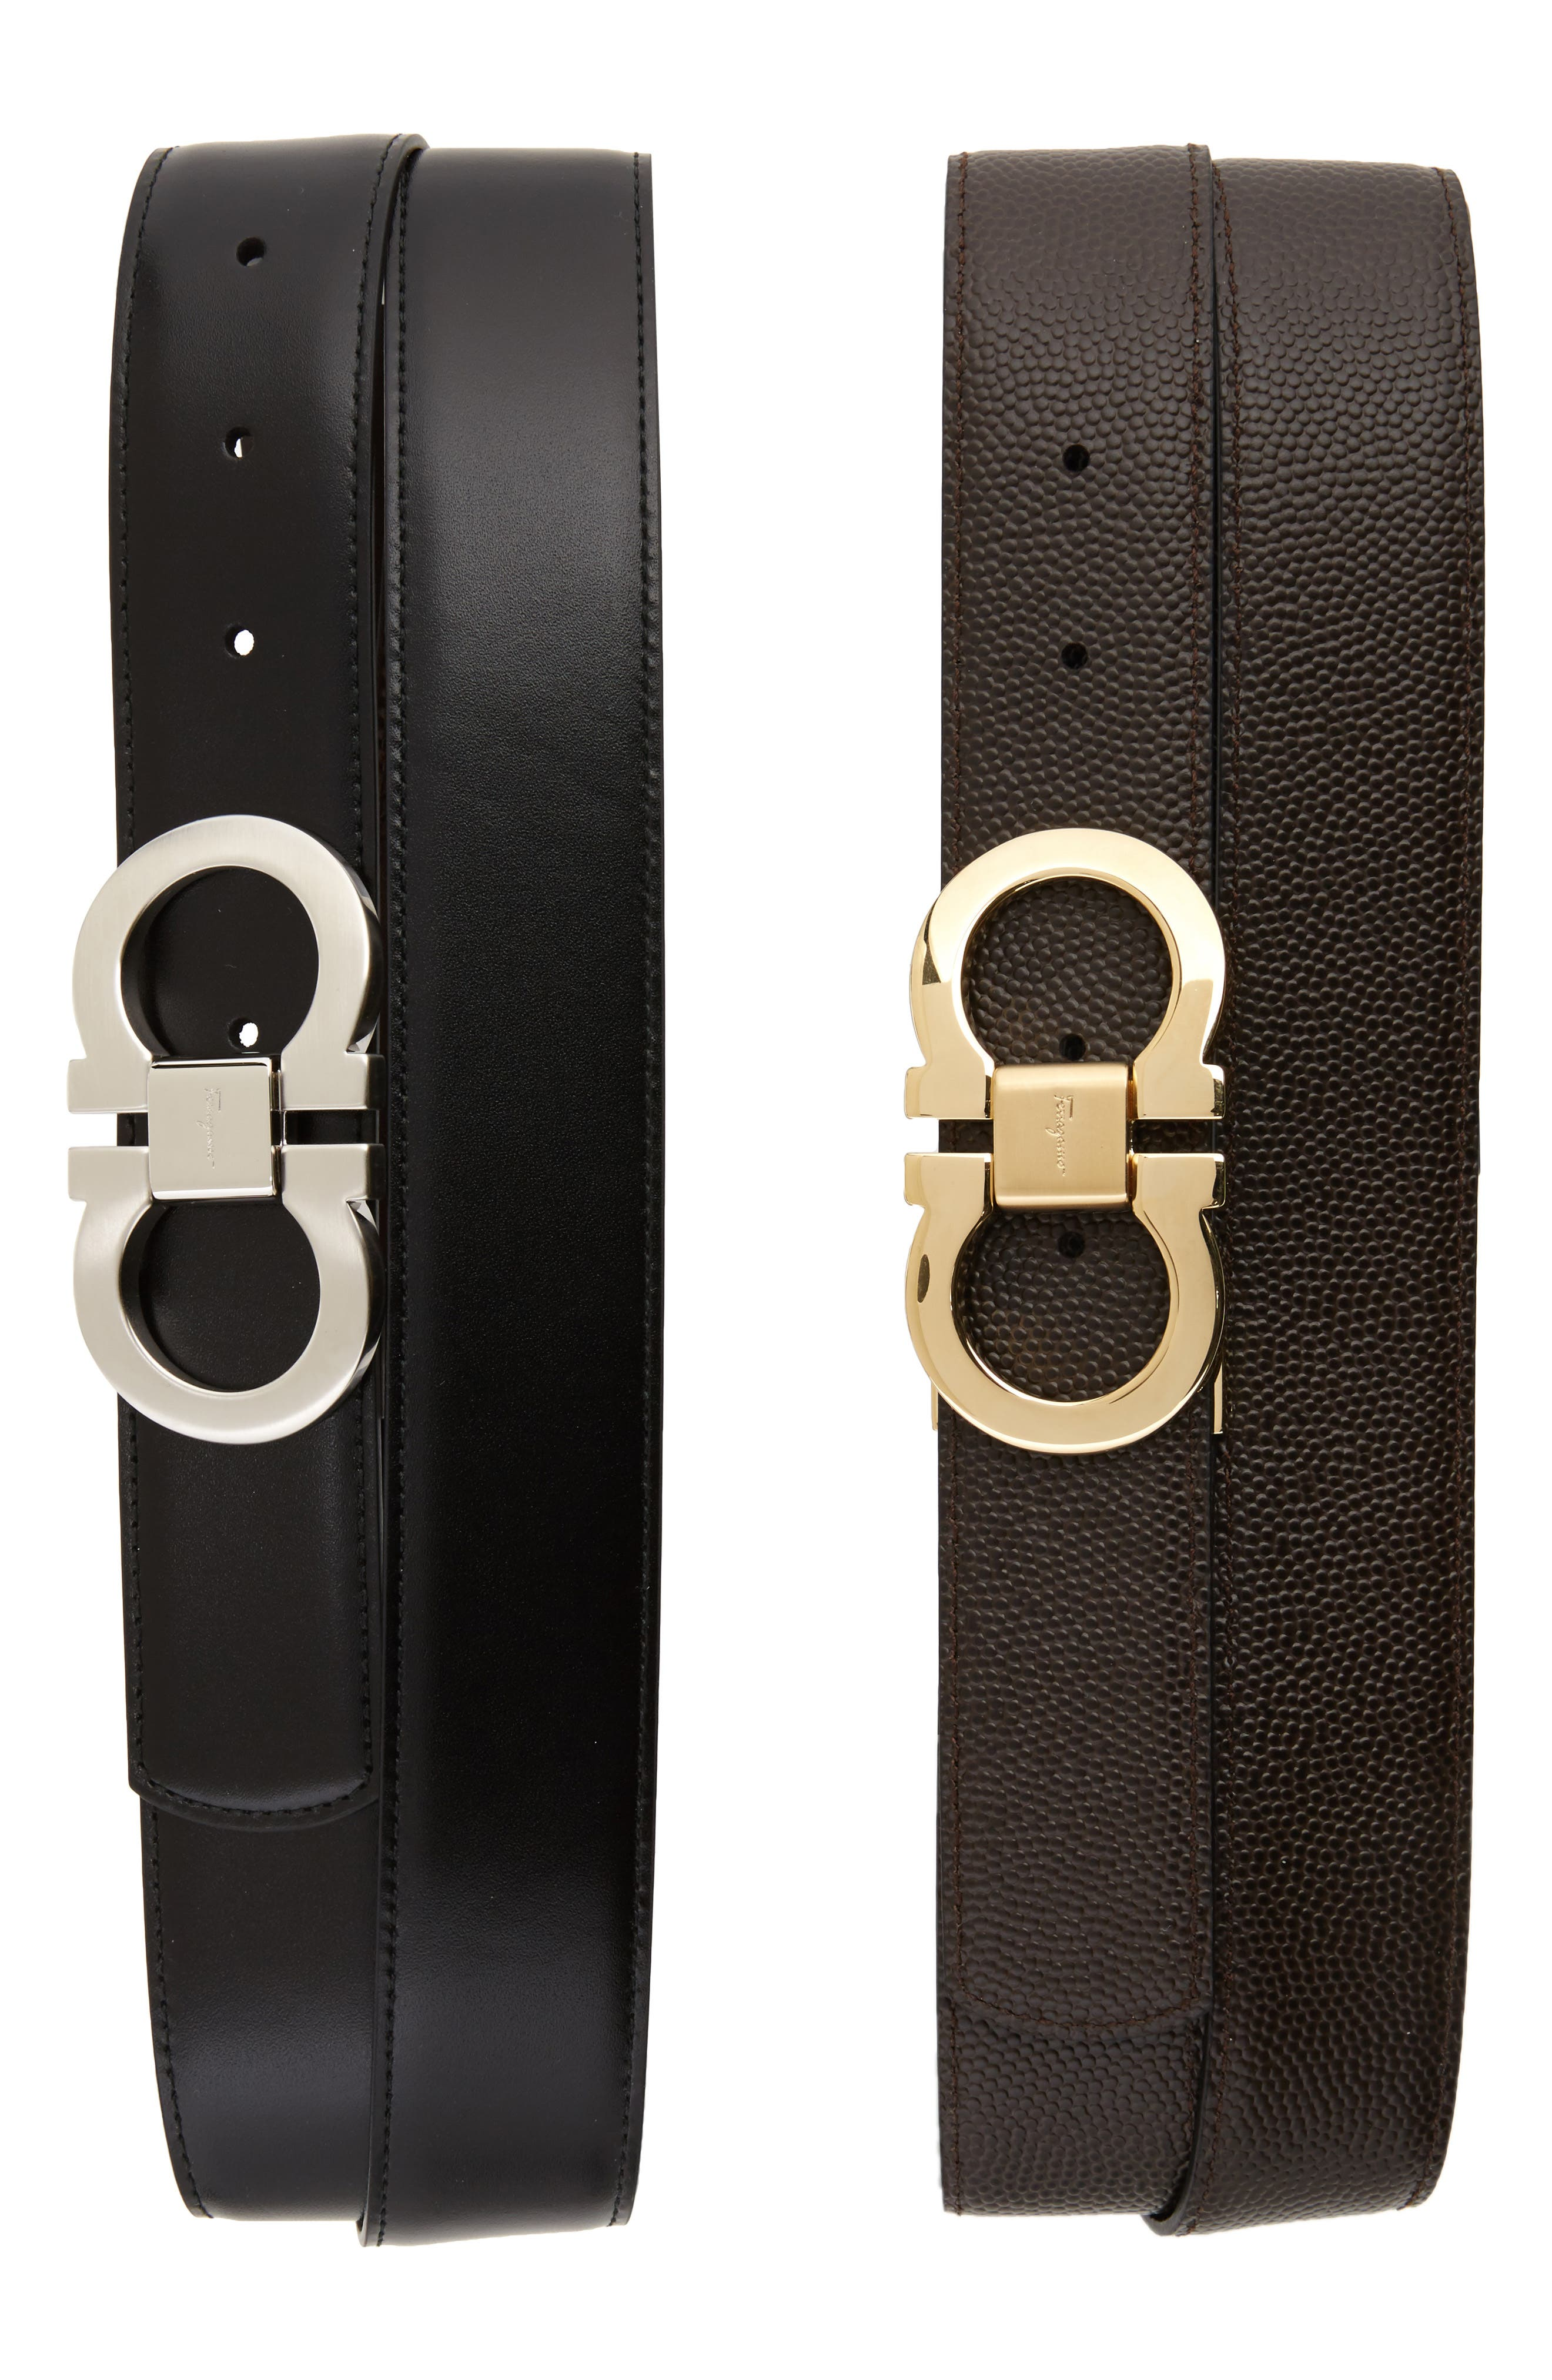 SALVATORE FERRAGAMO Leather Belt Box Set, Main, color, BLACK/ BROWN